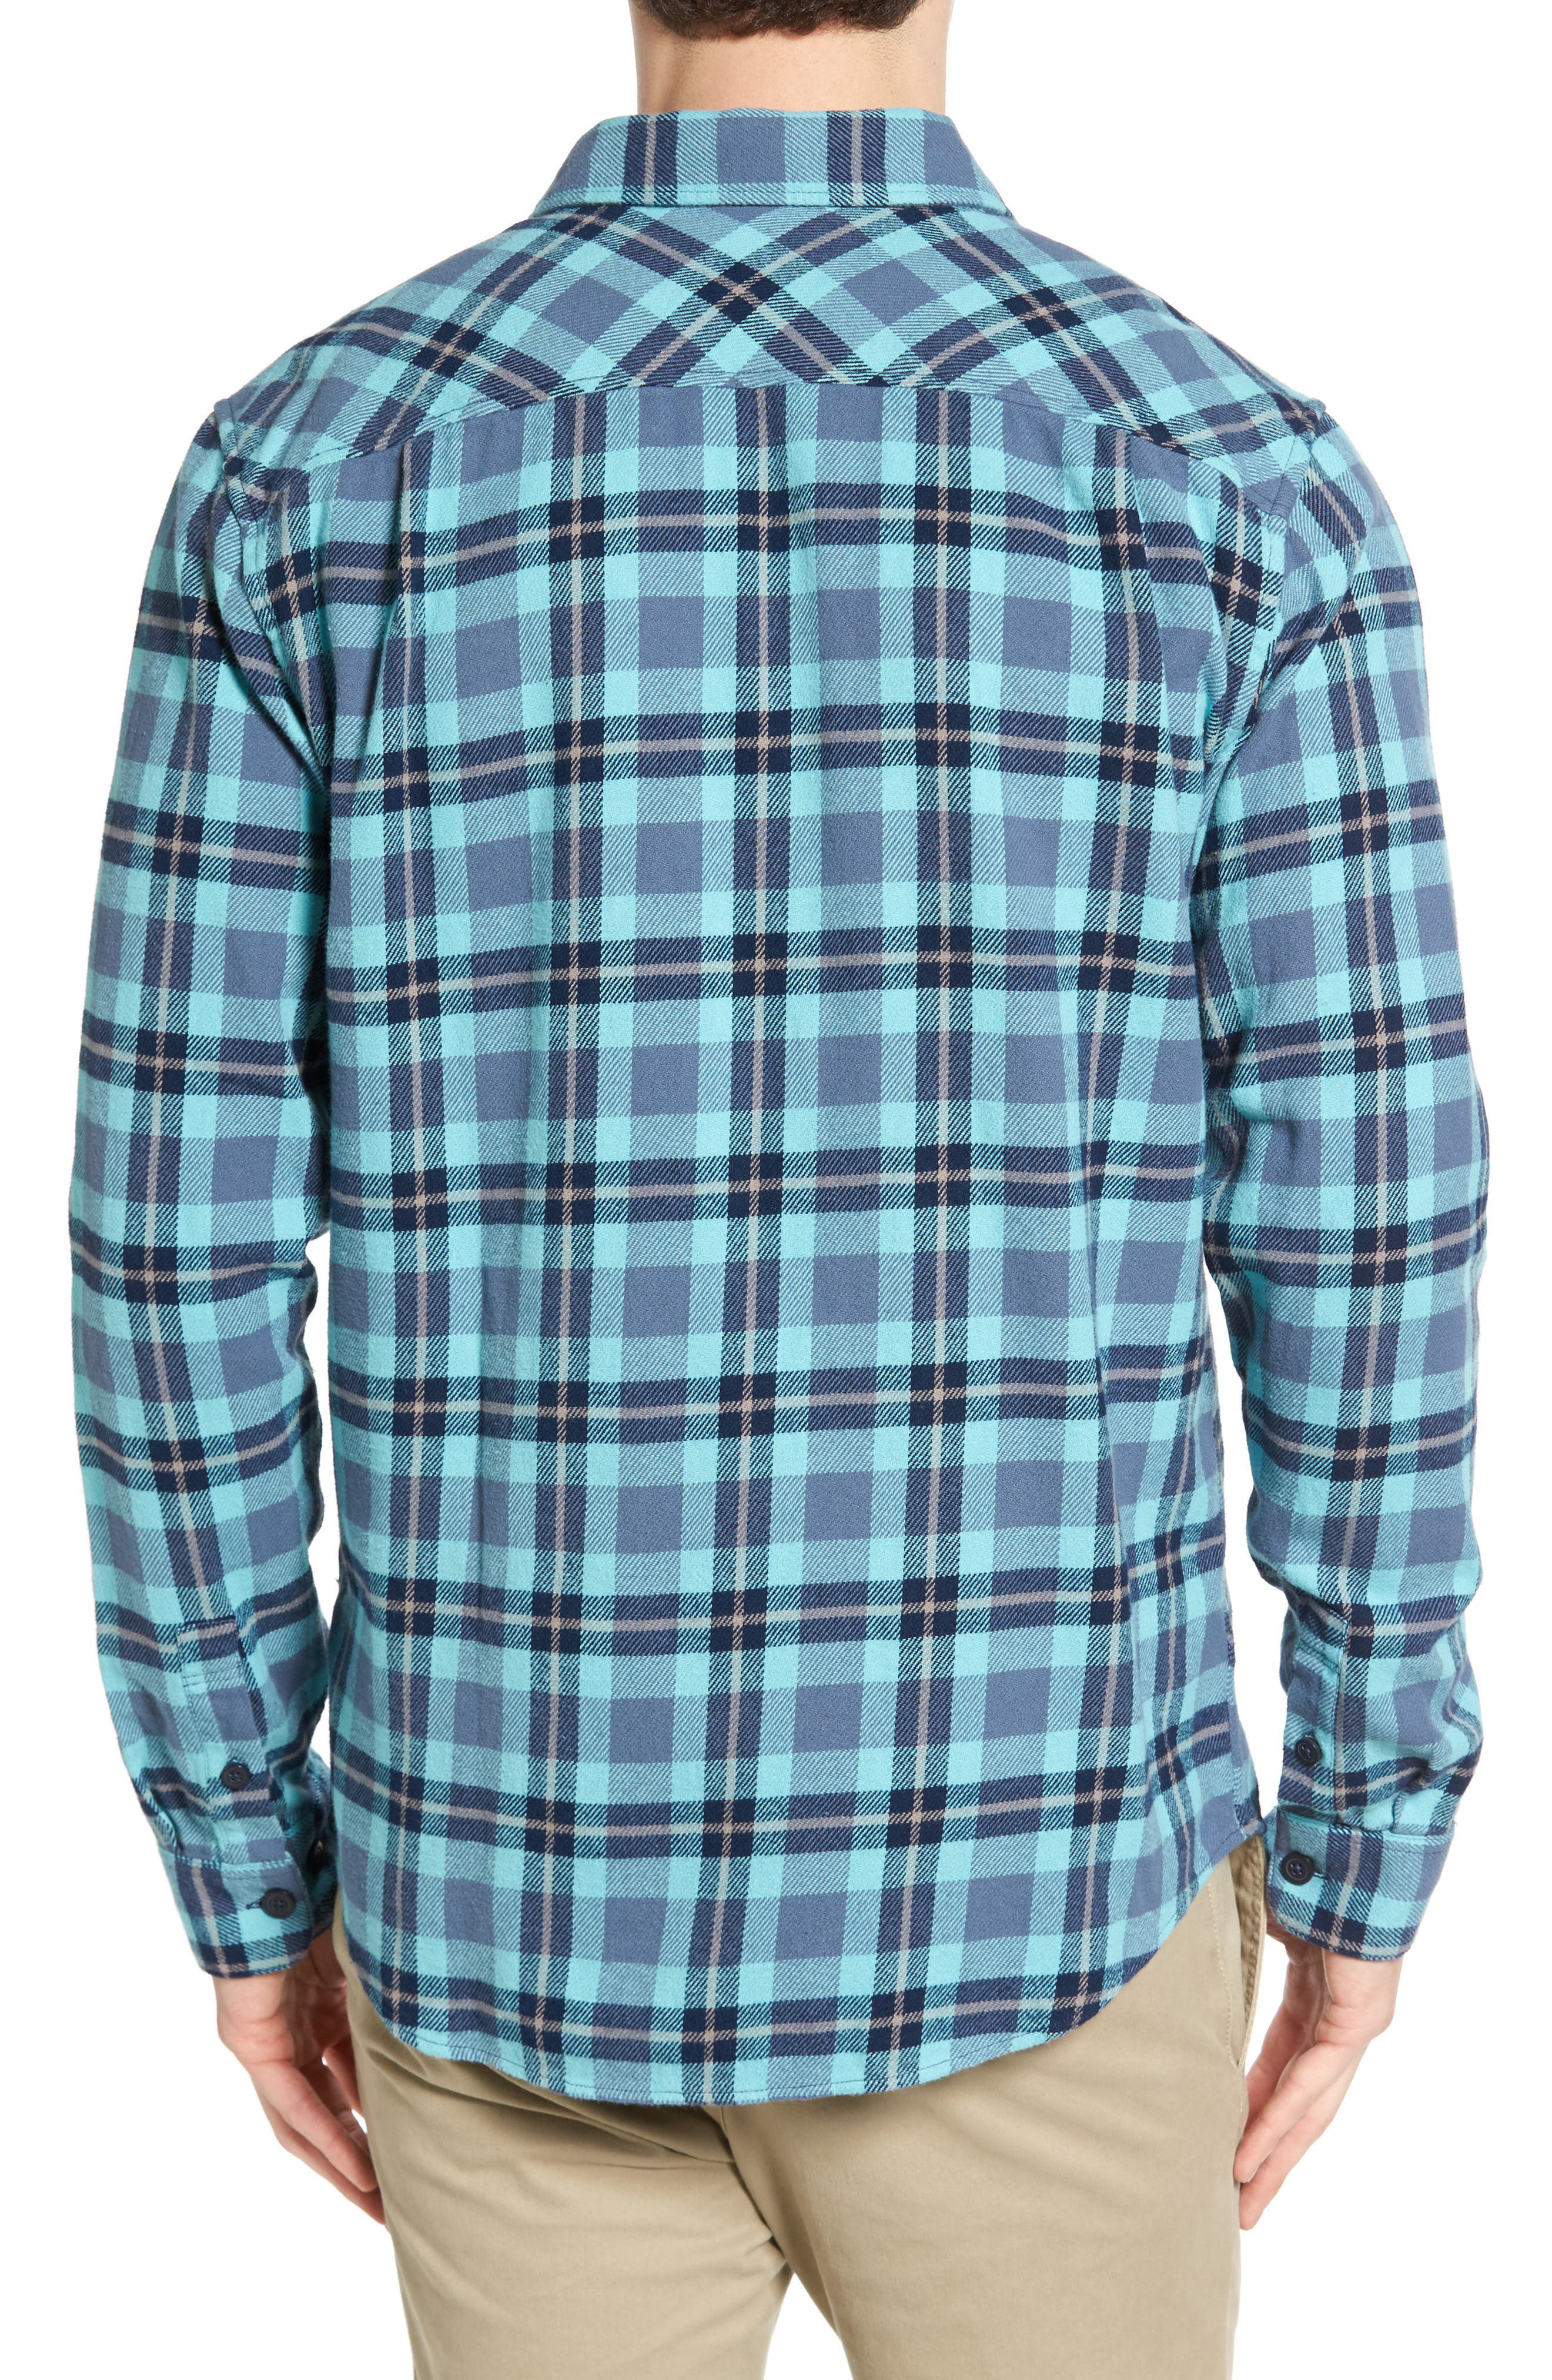 'That'll Work' Trim Fit Plaid Flannel Shirt,                             Alternate thumbnail 12, color,